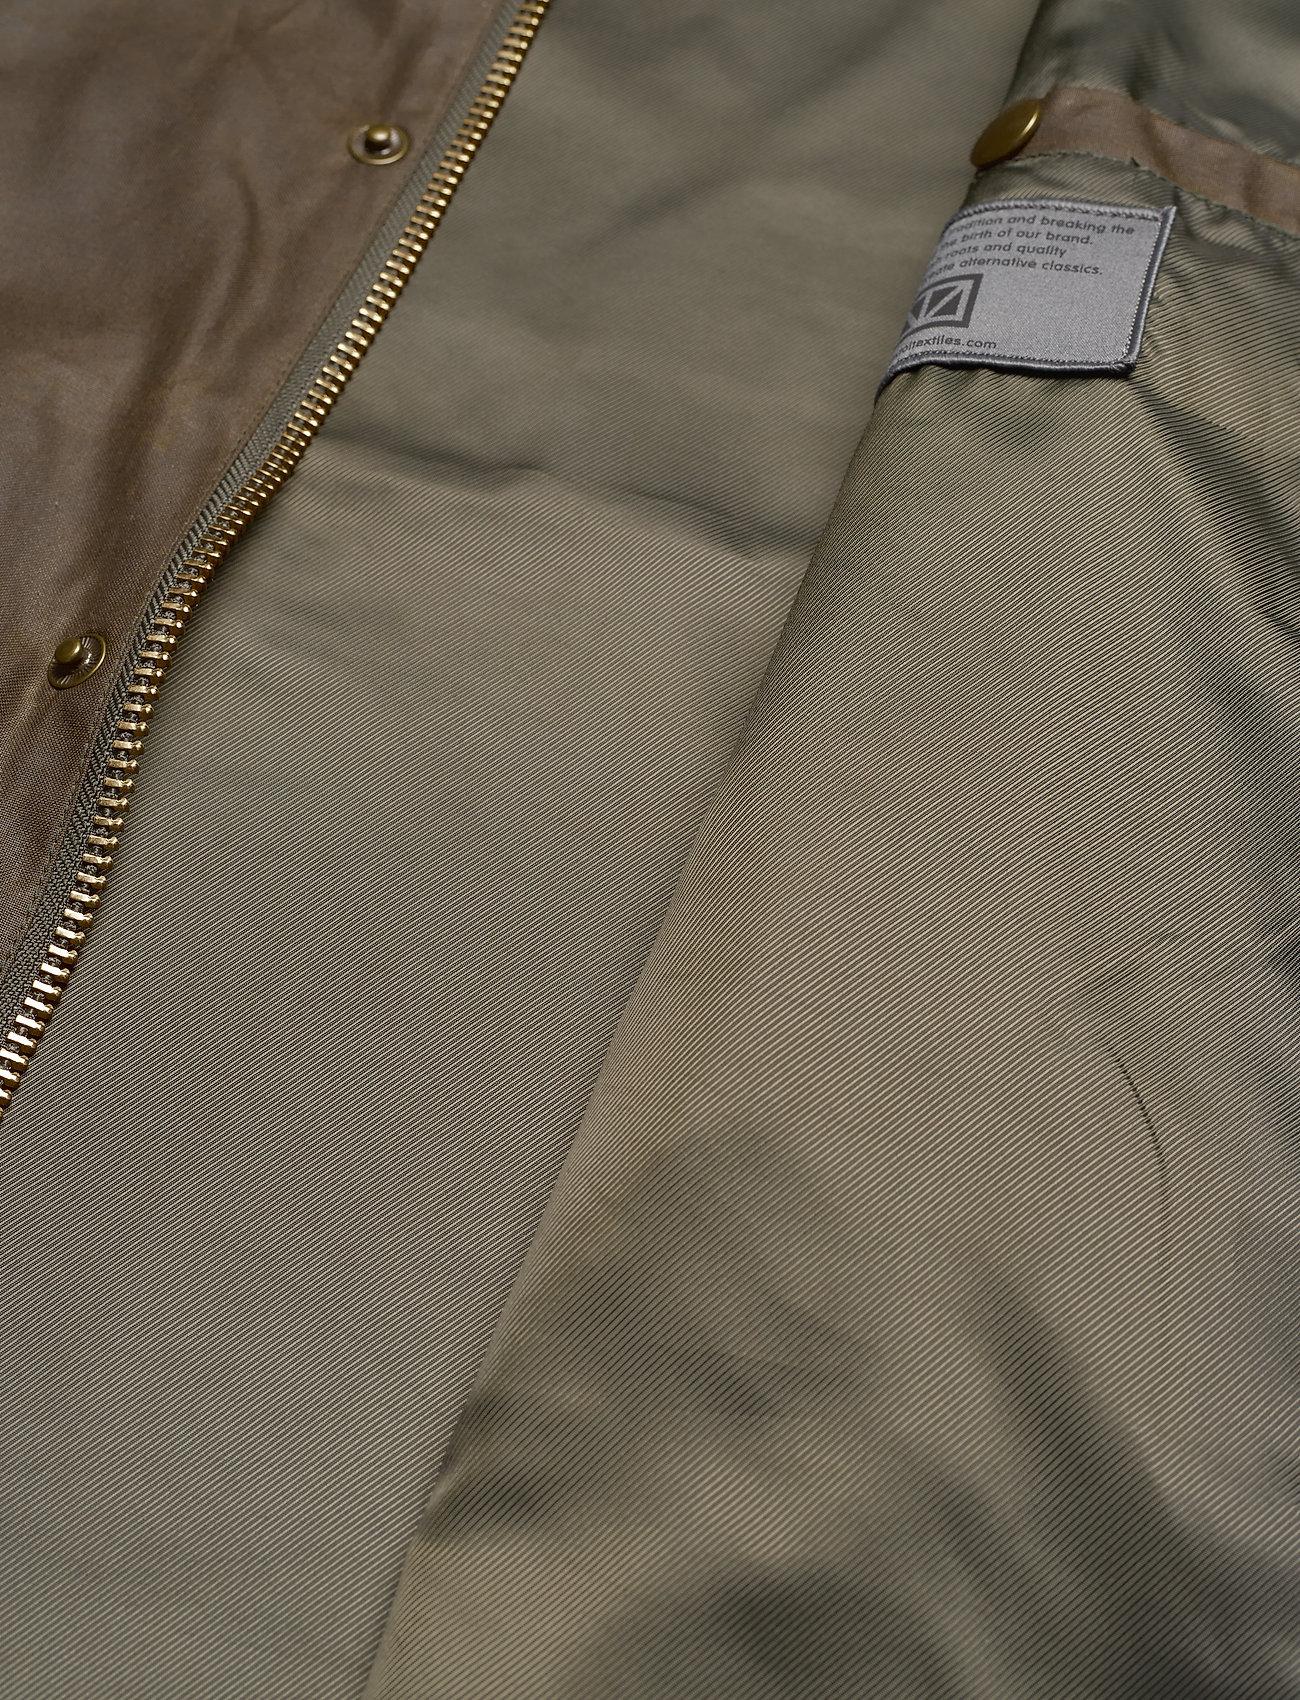 Brixtol Textiles - Buddy - kurtki-wiosenne - light olive - 9